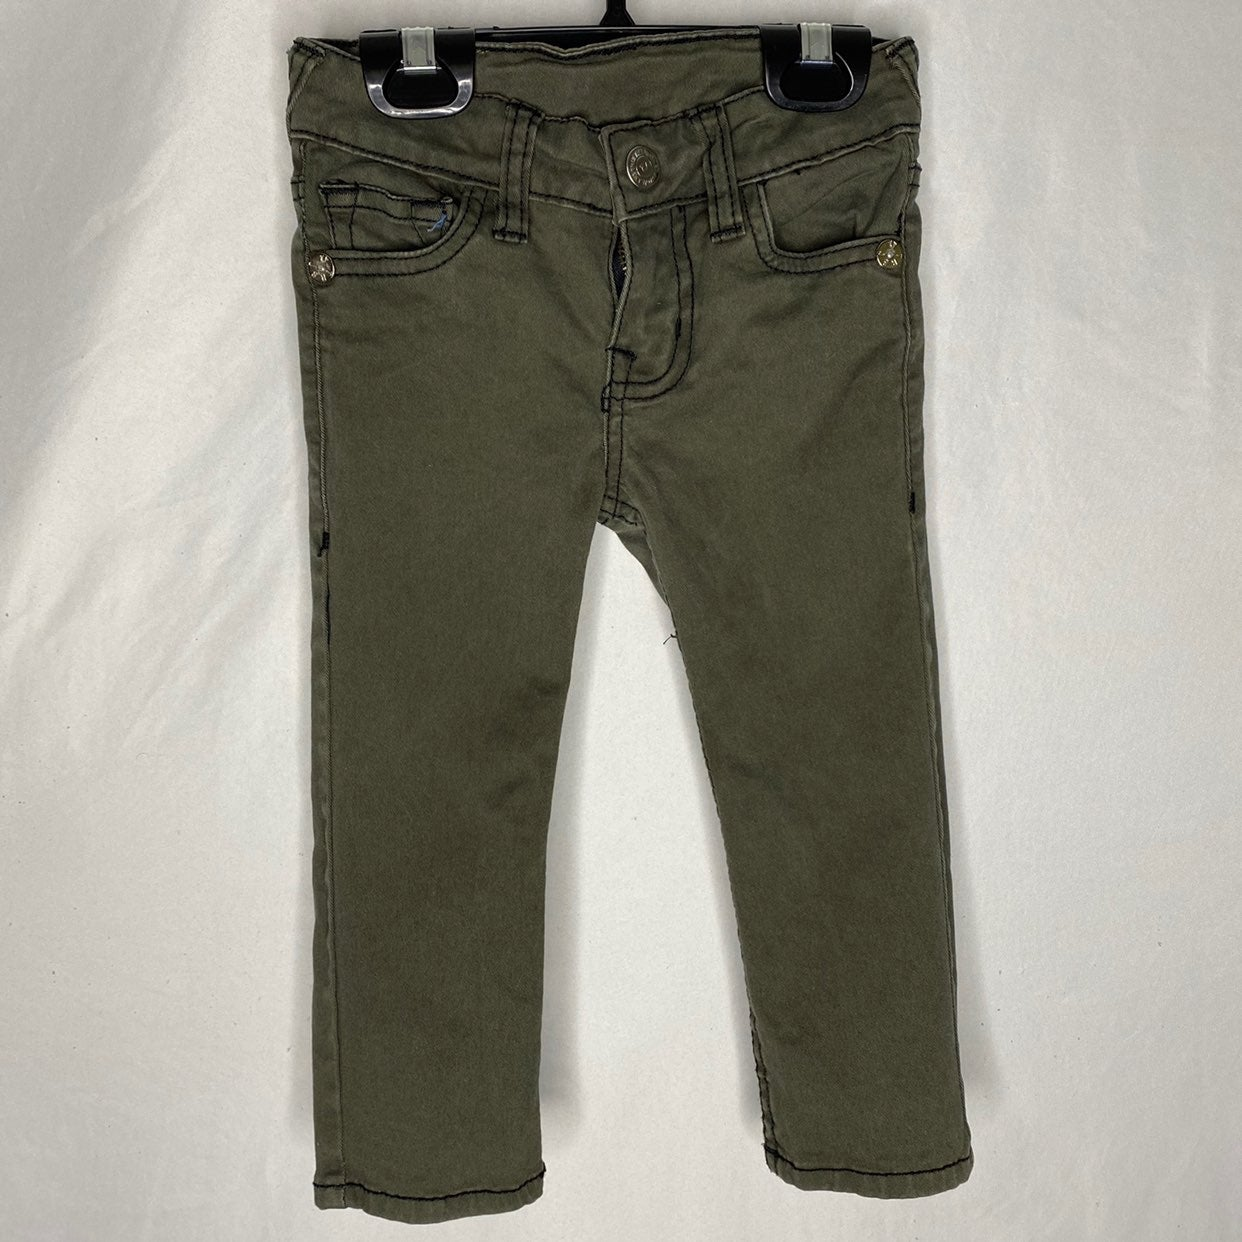 True Religion jeans Size 2T